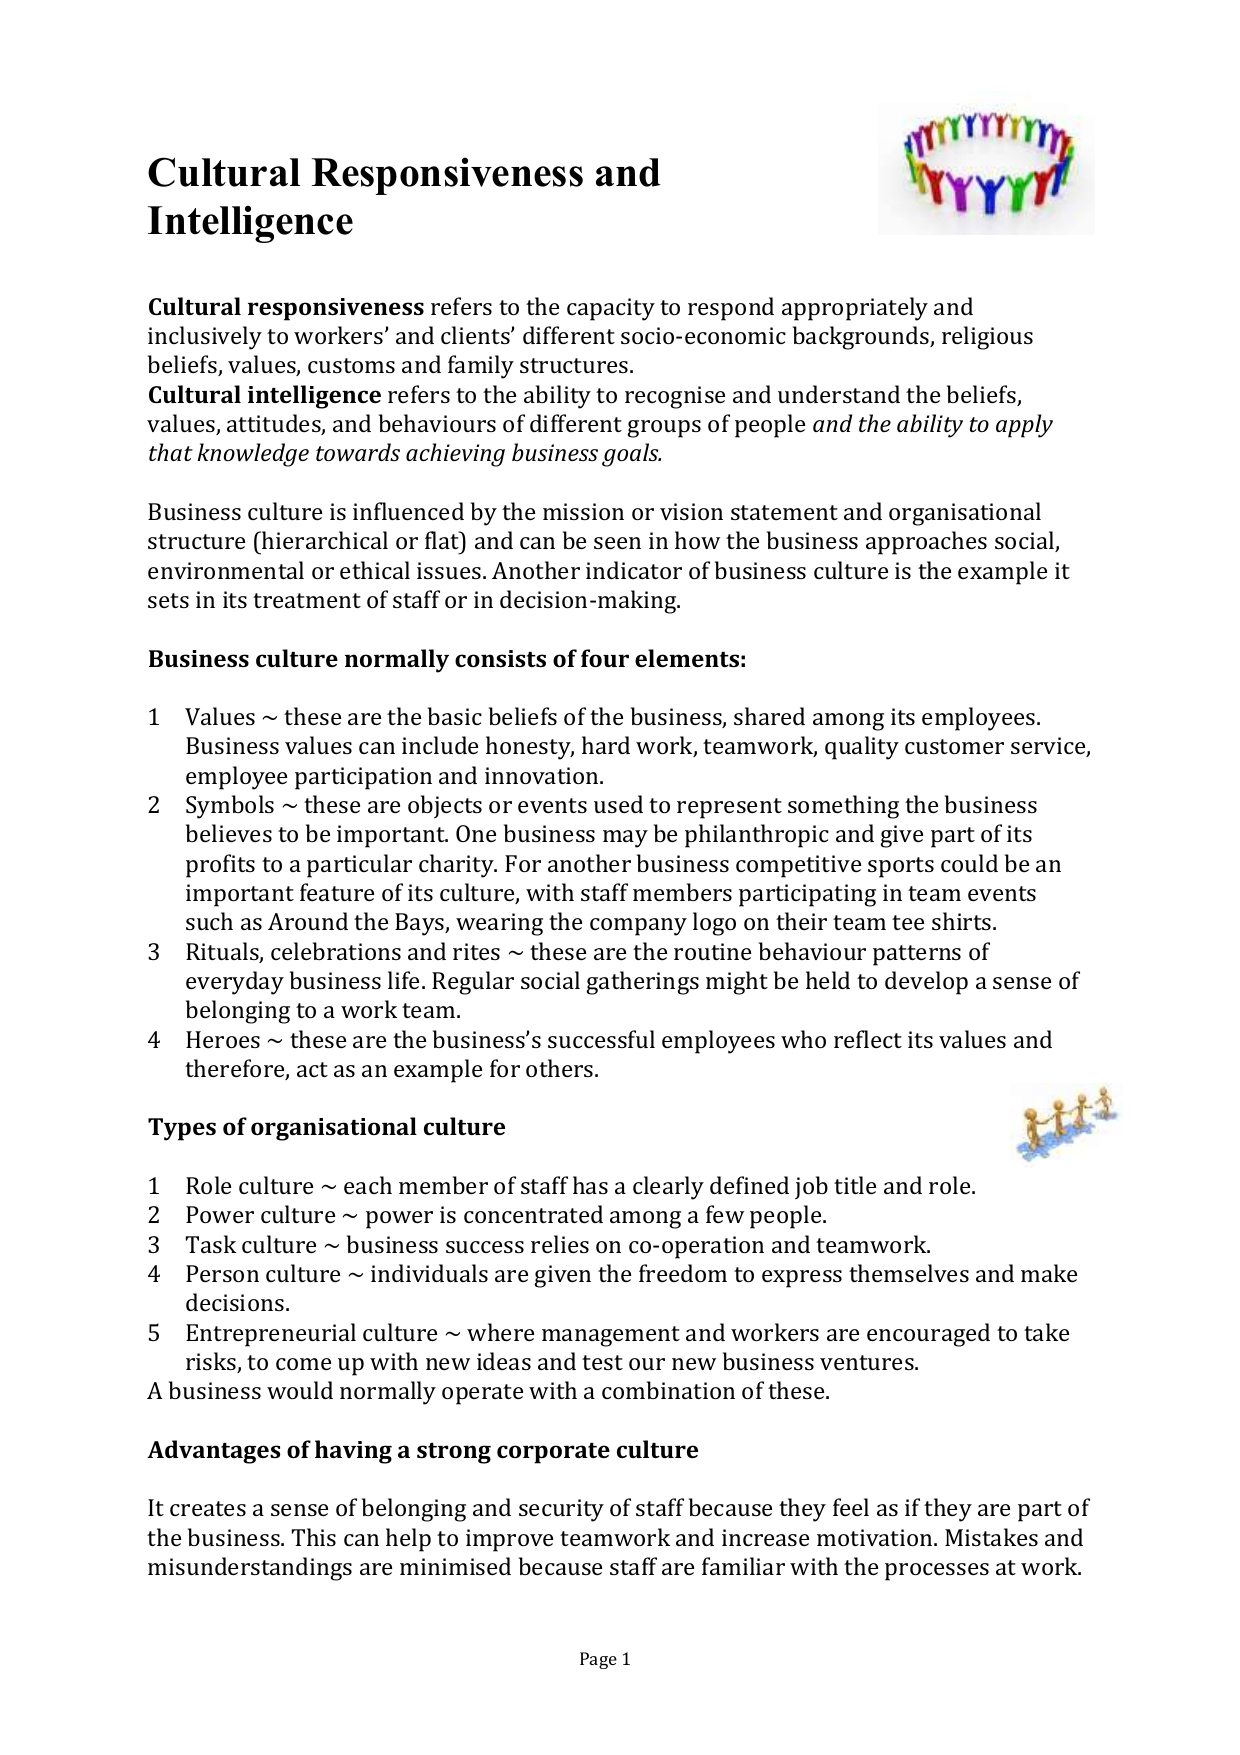 advantages of organisational culture